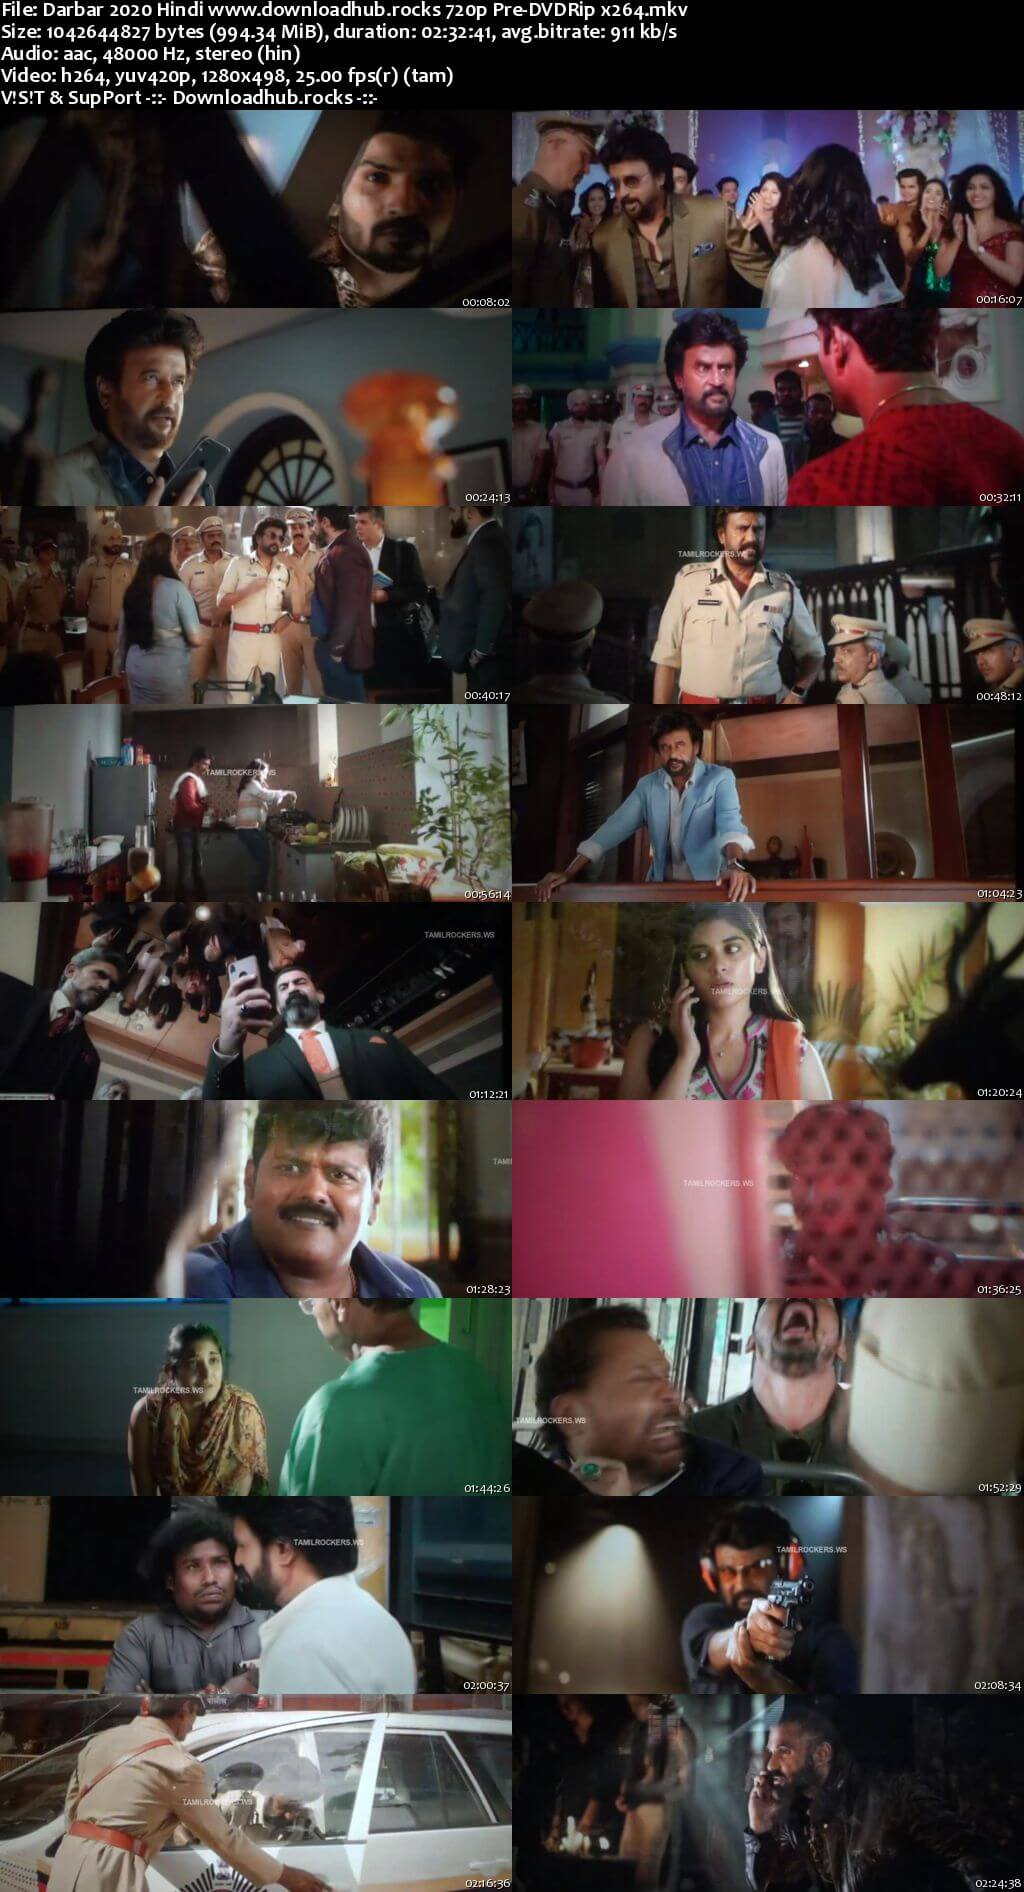 Darbar 2020 Hindi 720p 480p Pre-DVDRip x264